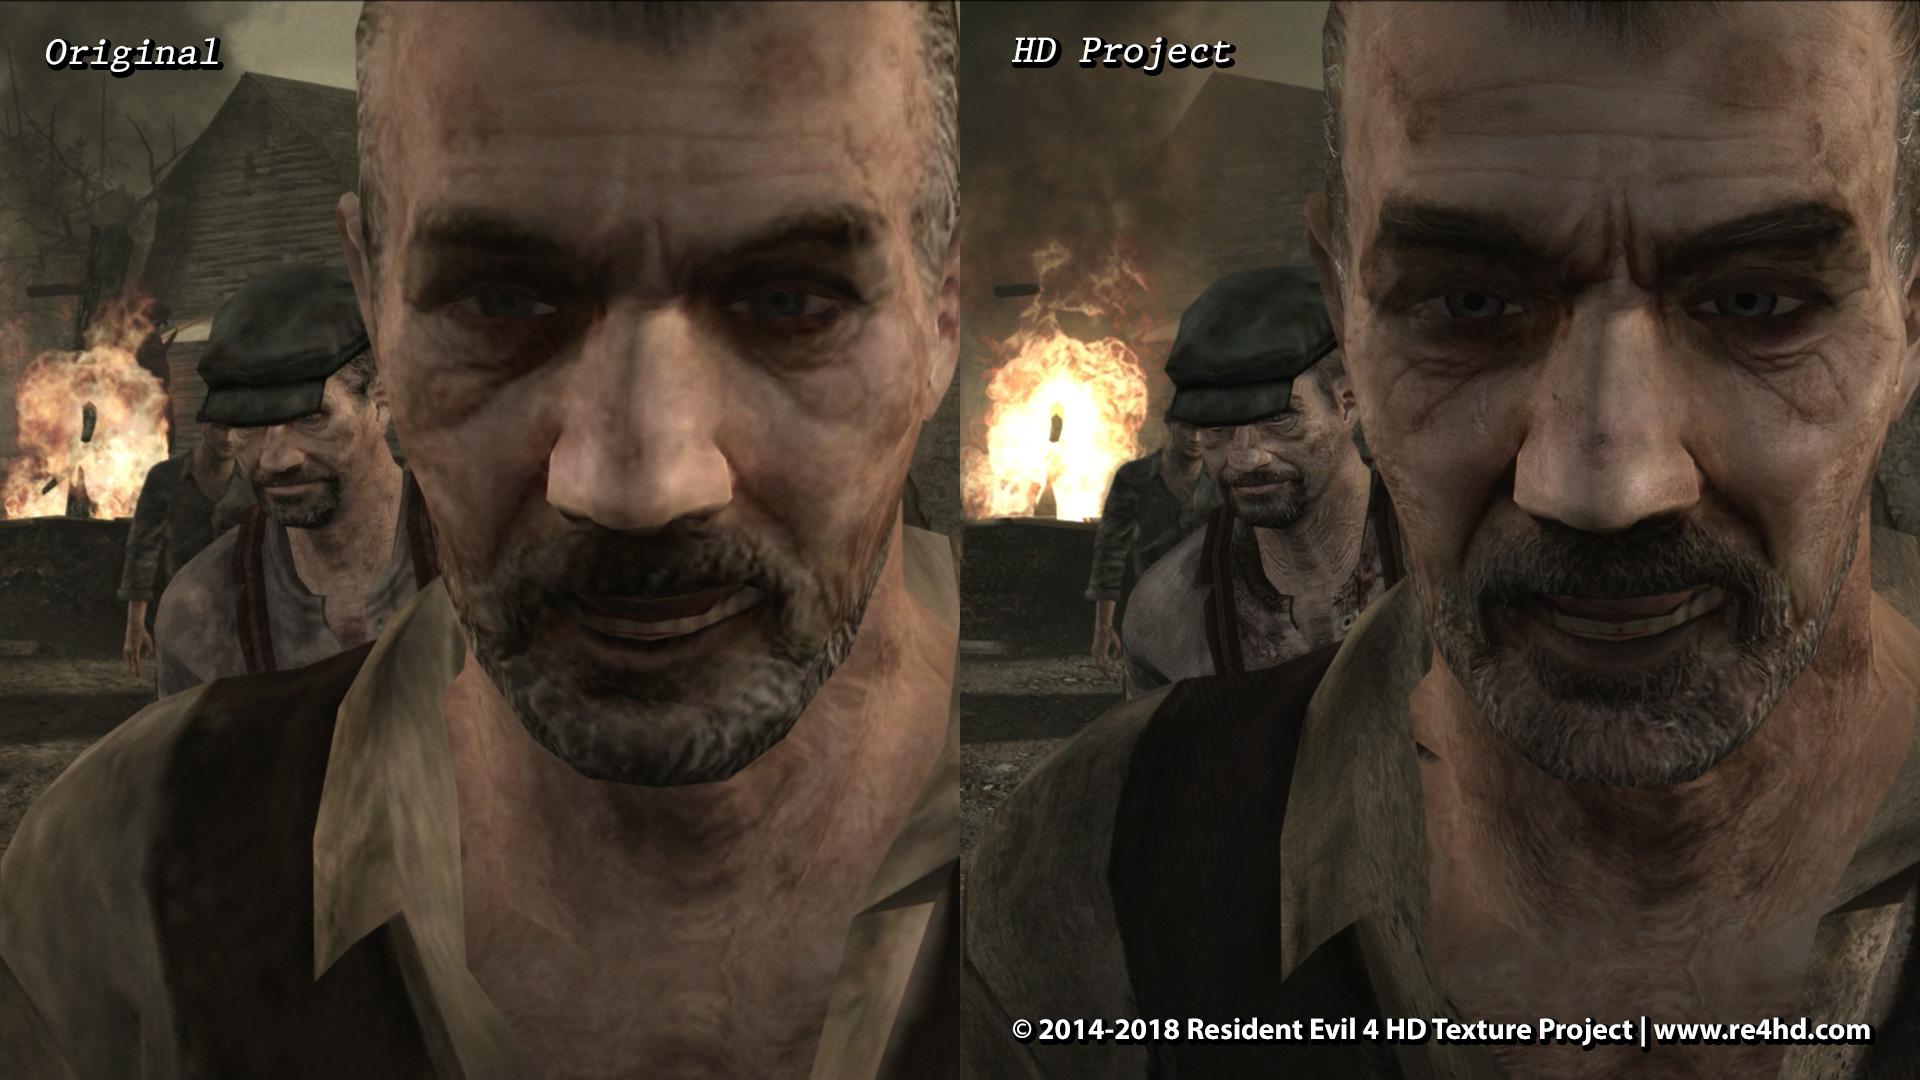 Resident Evil 4 Hd Project New Screenshots Showcase Character